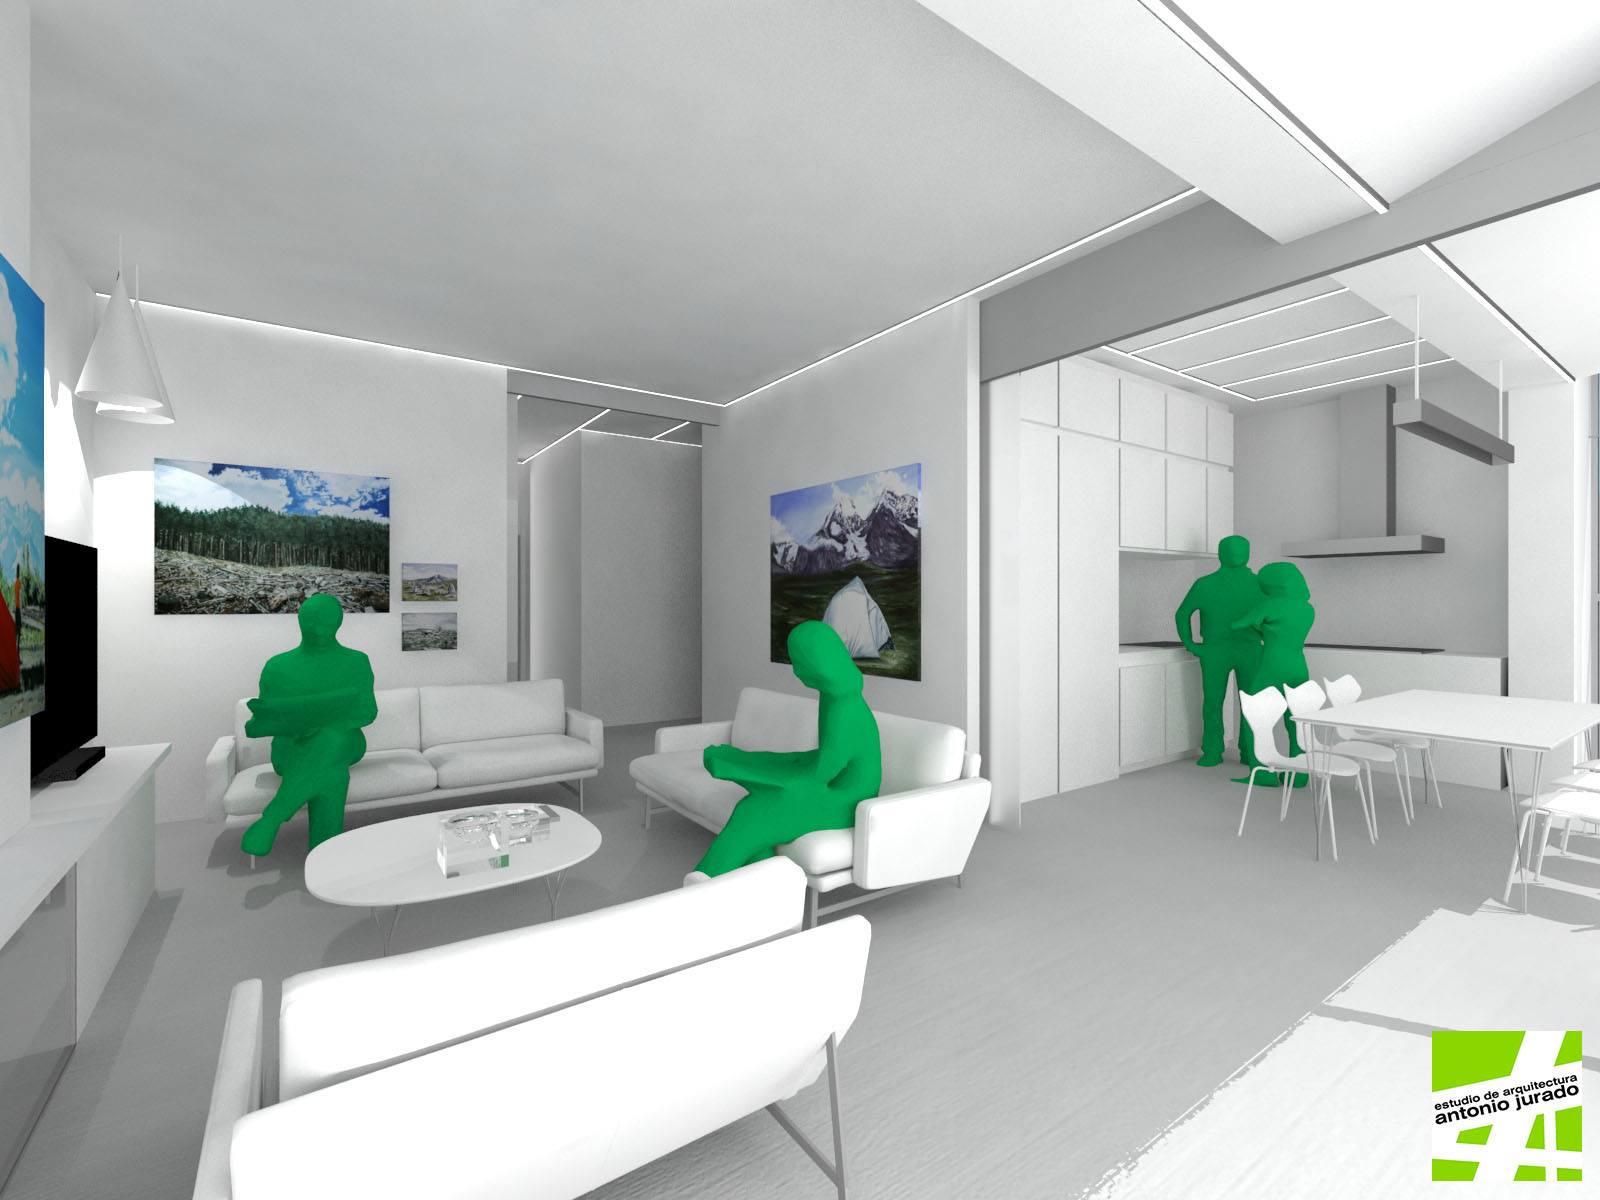 irene-sanchez-moreno-eldevenir-art-gallery-galeria-arte-online-torrox-malaga-contemporaneo-antonio-jurado-arquitectura (1).jpg